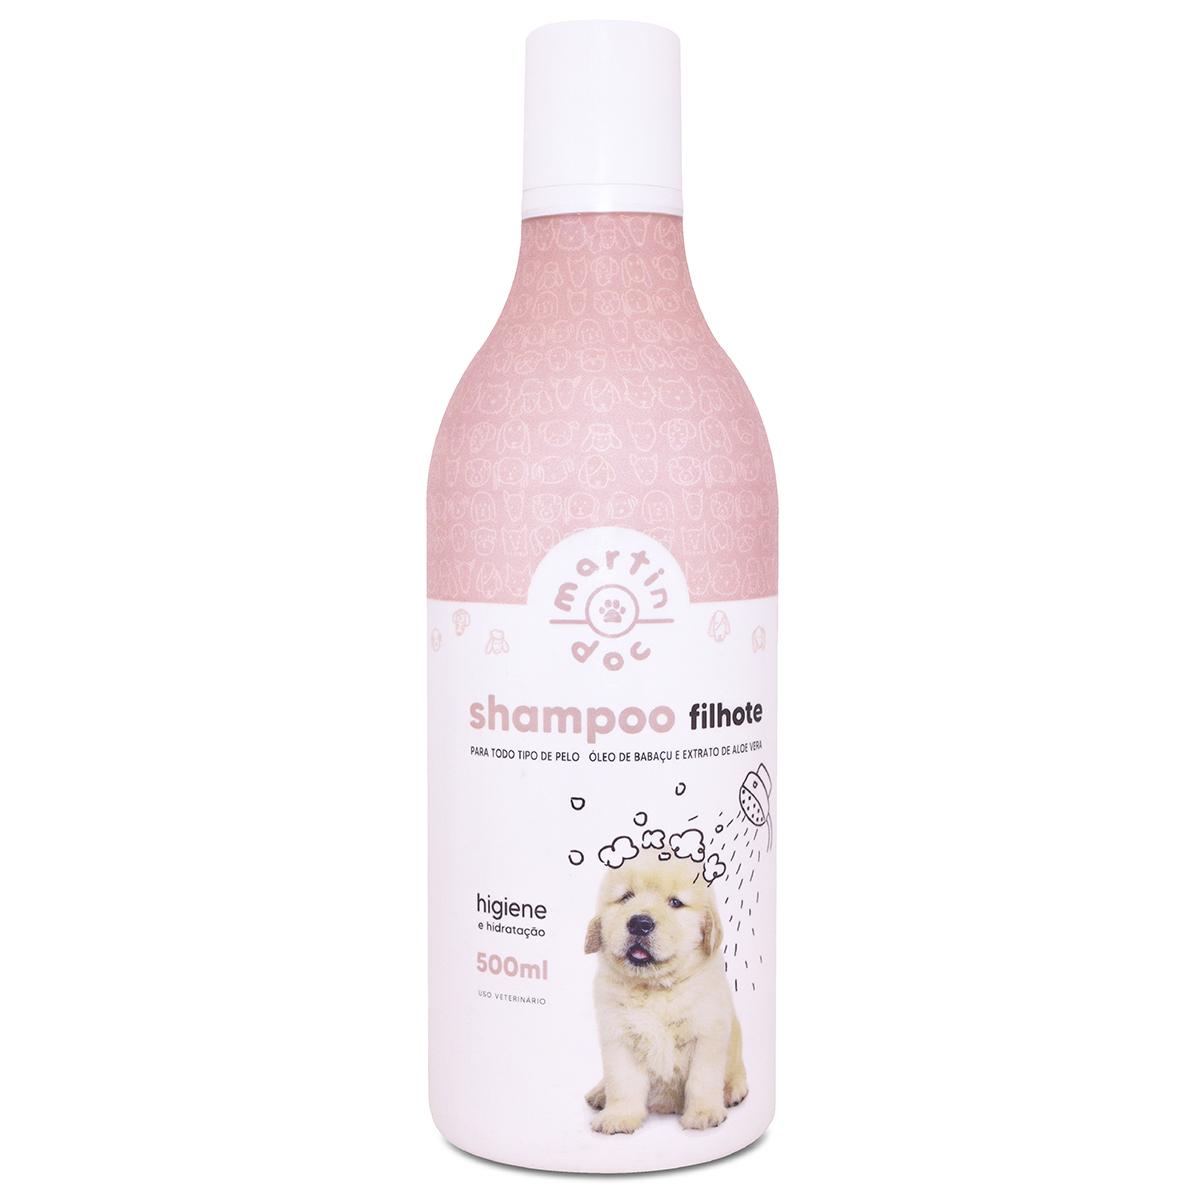 Shampoo Filhotes Martindoc 500 ml